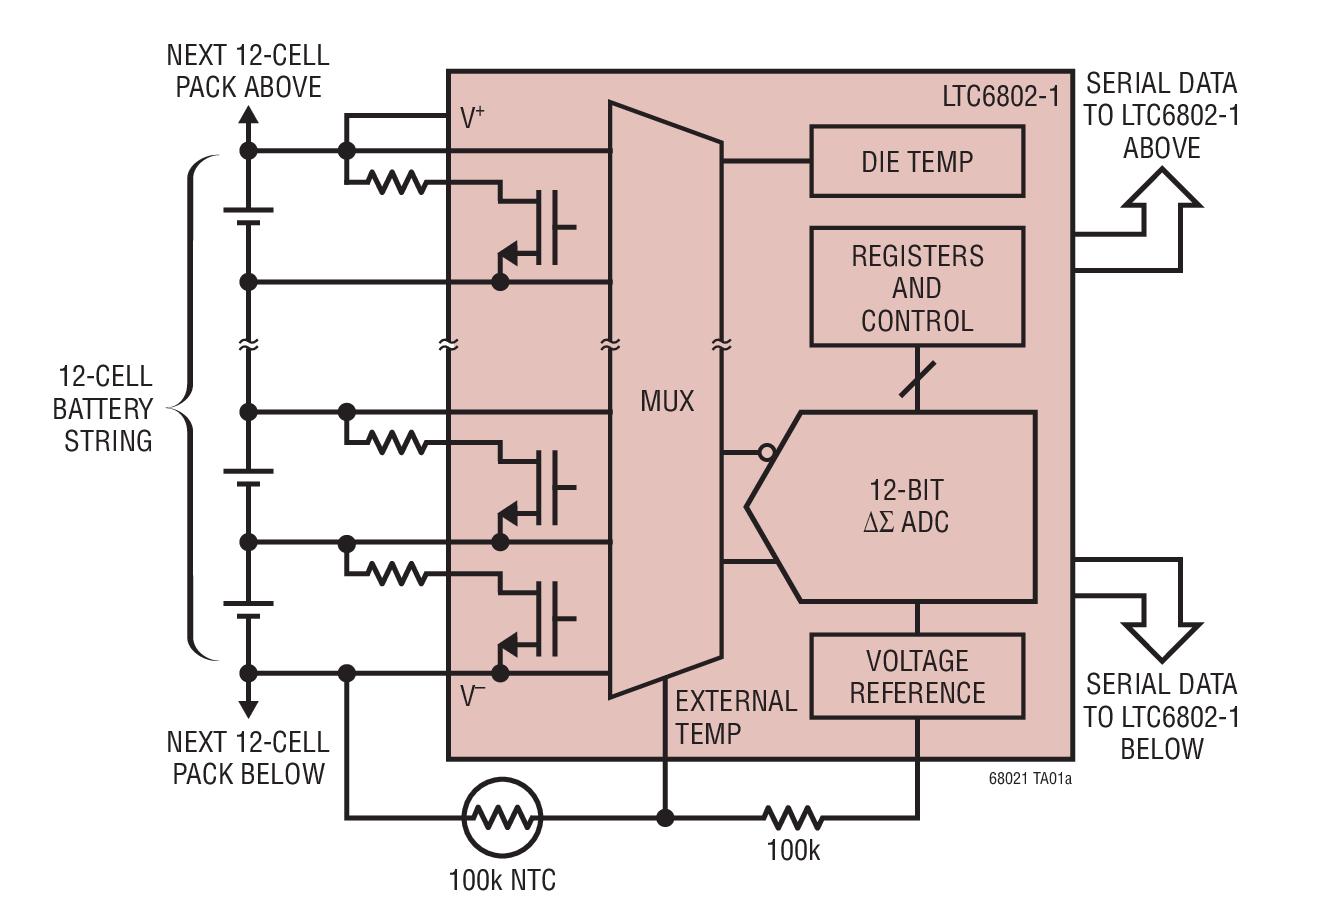 LTC6802-1 多节电池的电池组监视器